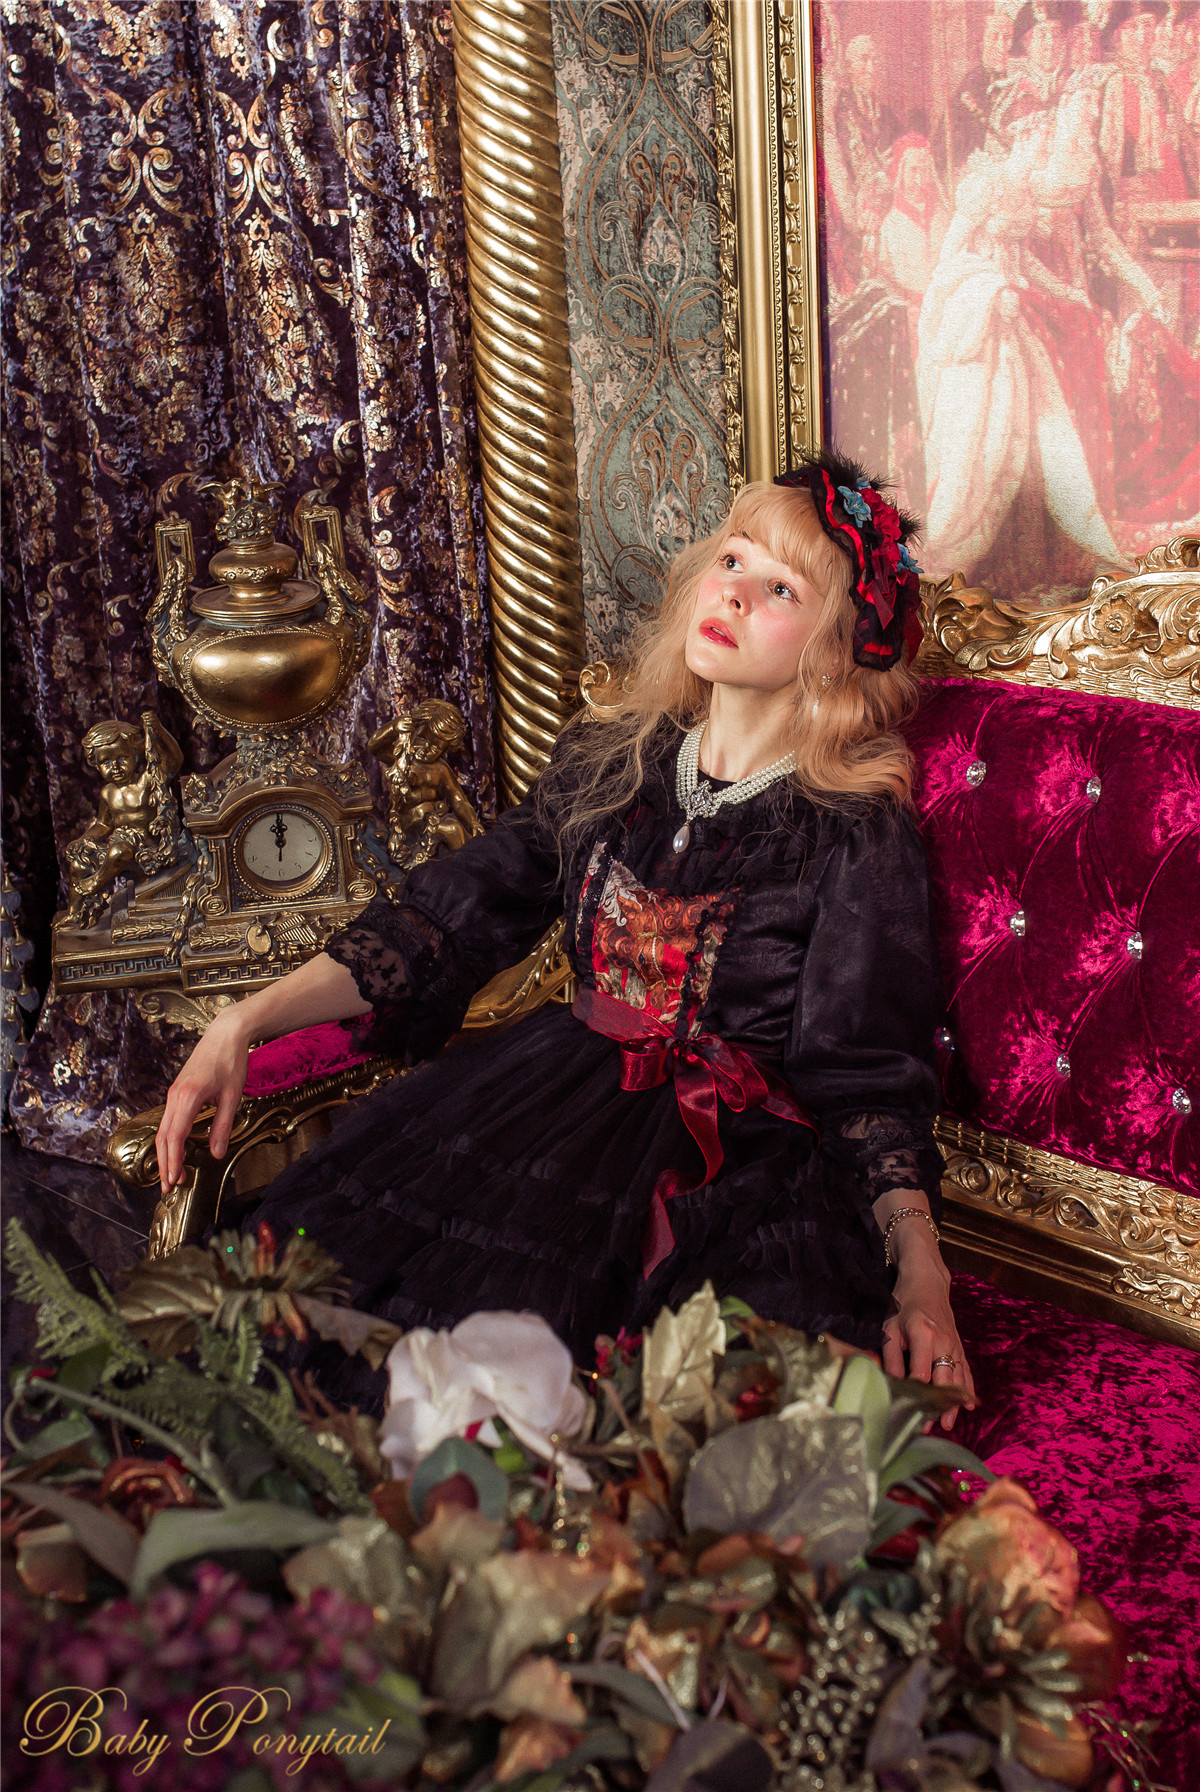 Babyponytail_Portrait of Victory_model photo_OP black_claudia_16.jpg